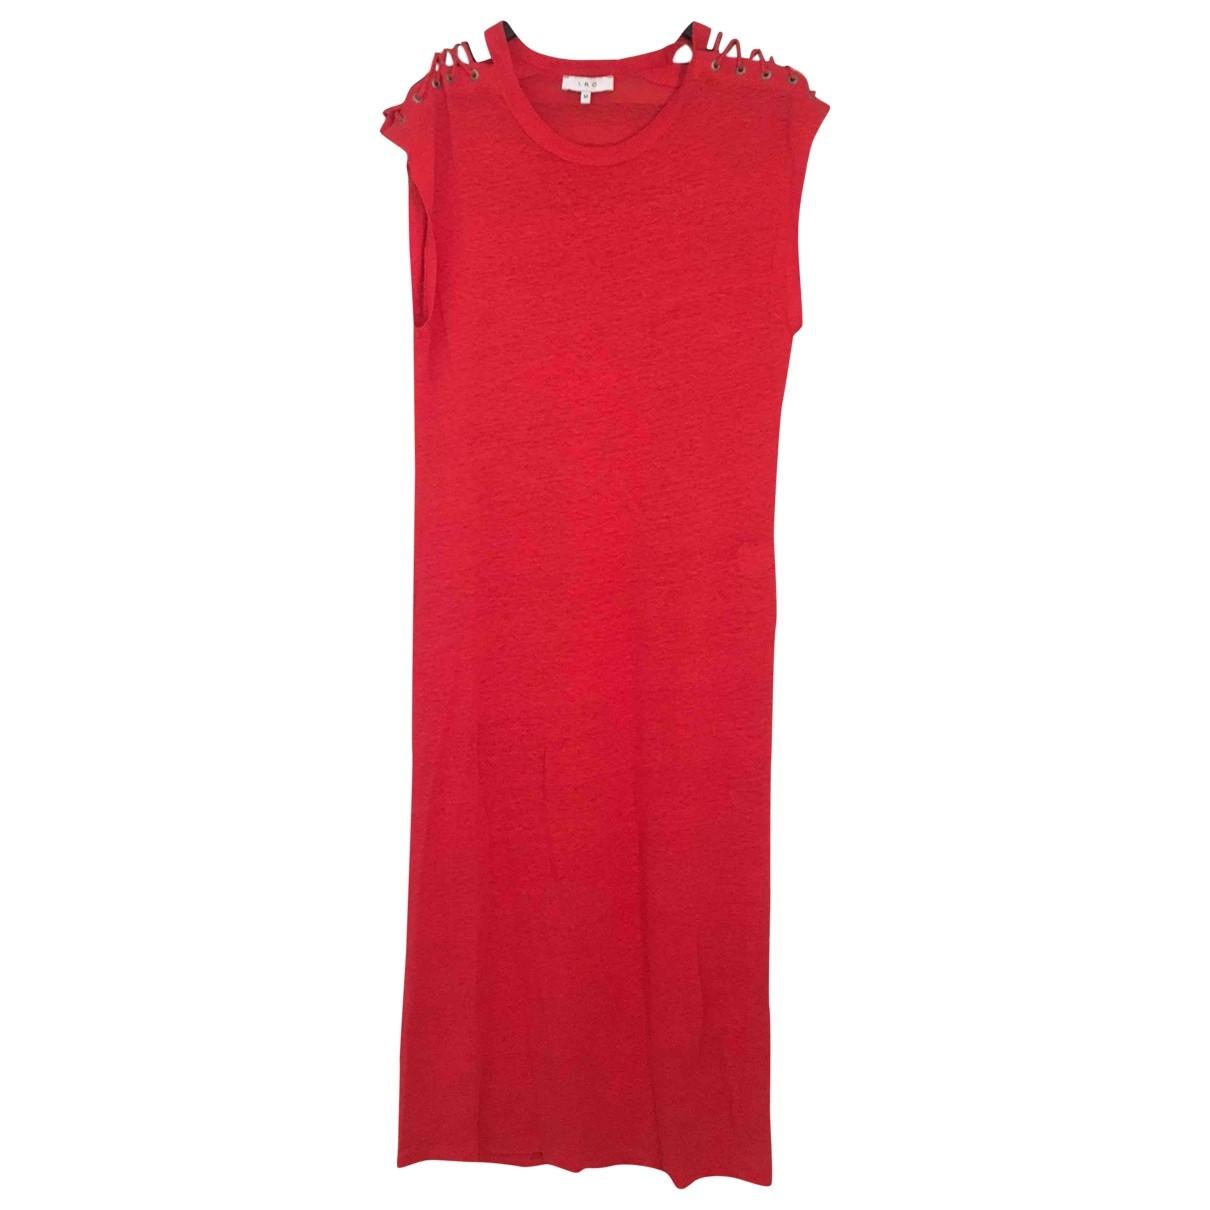 Iro \N Red Linen dress for Women M International